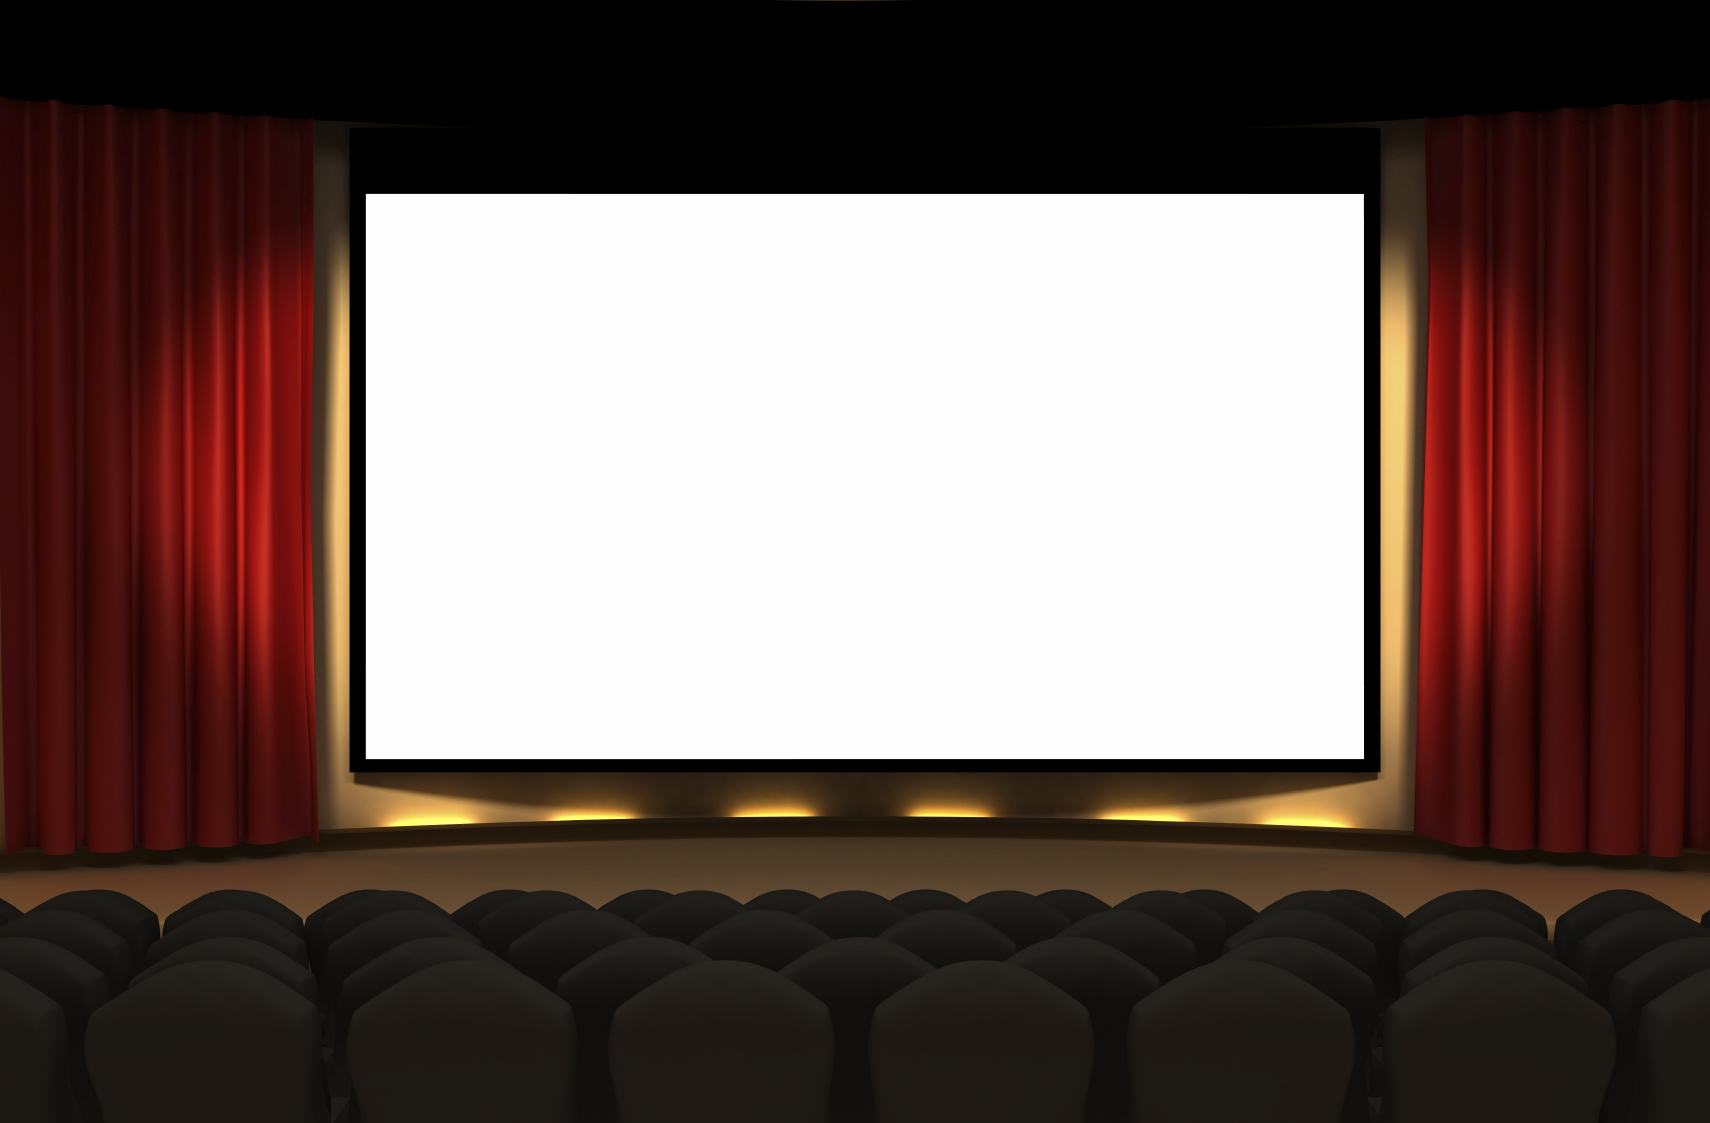 Cinema screen clipart.